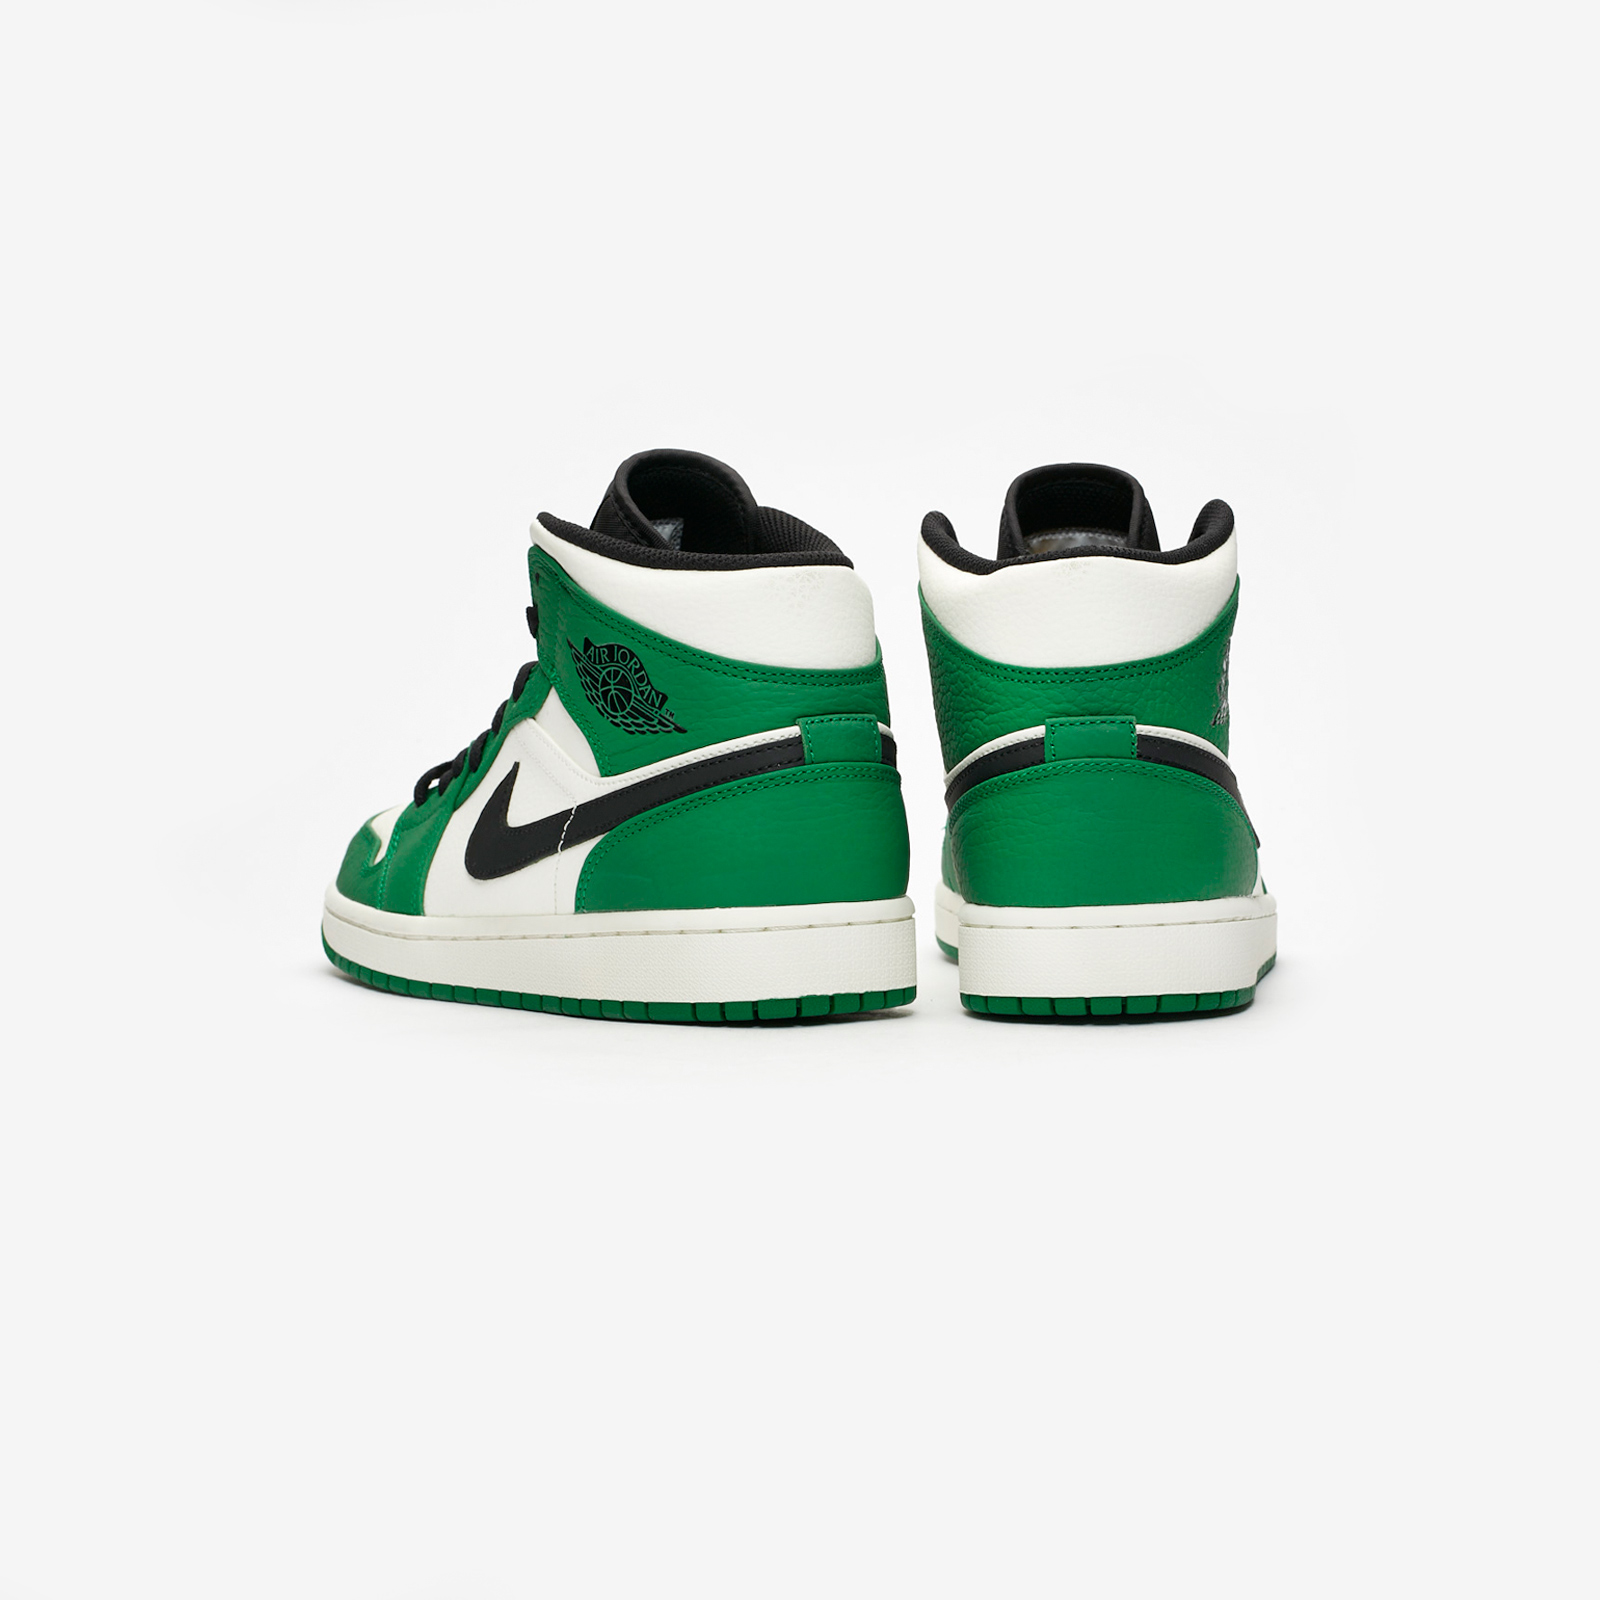 5e4a96853486 Jordan Brand Air Jordan 1 Mid SE - 852542-301 - Sneakersnstuff ...